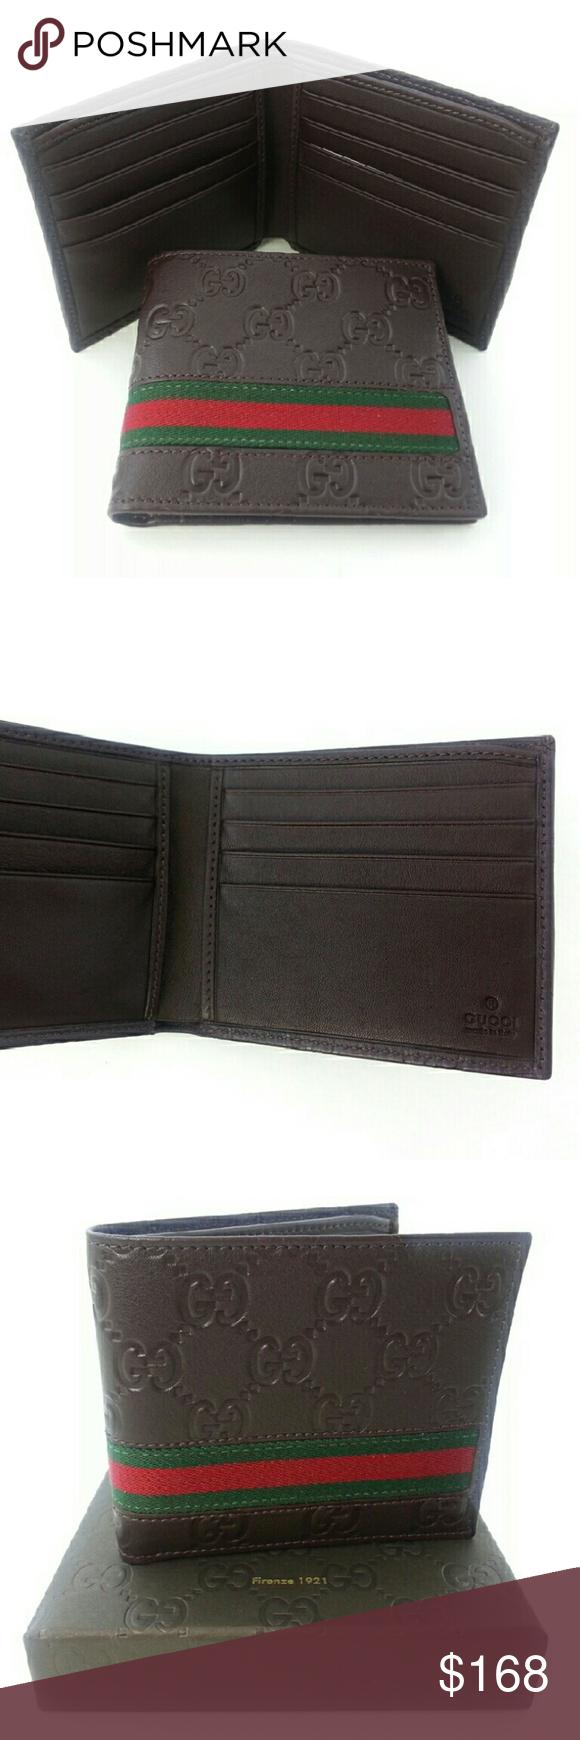 84e8561c67d9 GUCCI Authentic Mens Brown Web Strip Wallet W02 GUCCI Original Authentic  Mens Brown Web Strip Bi